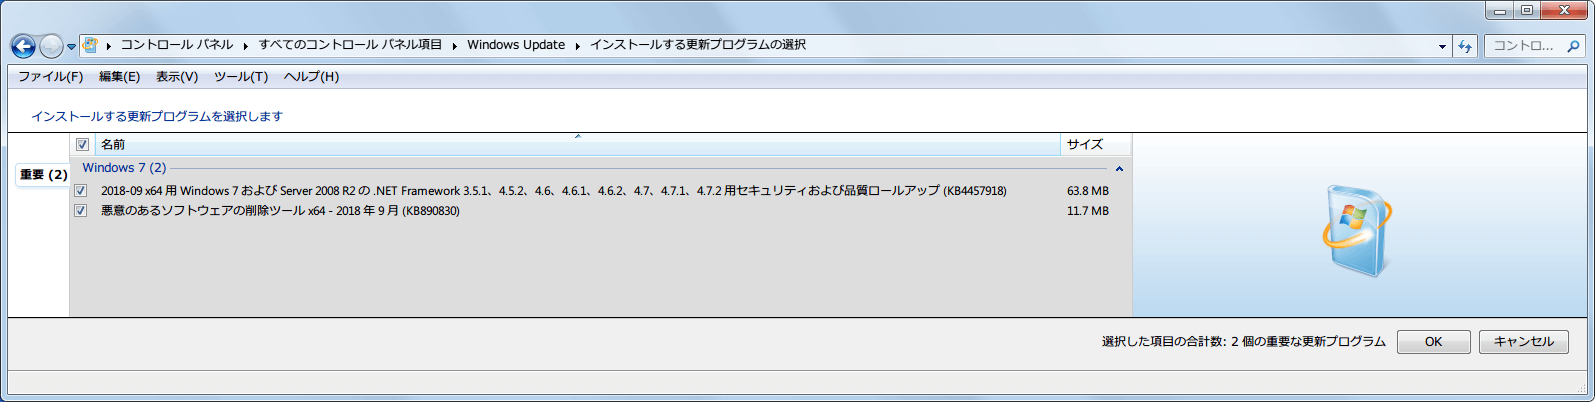 Windows 7 64bit Windows Update 重要 2018年9月公開分更新プログラム(重要)インストール